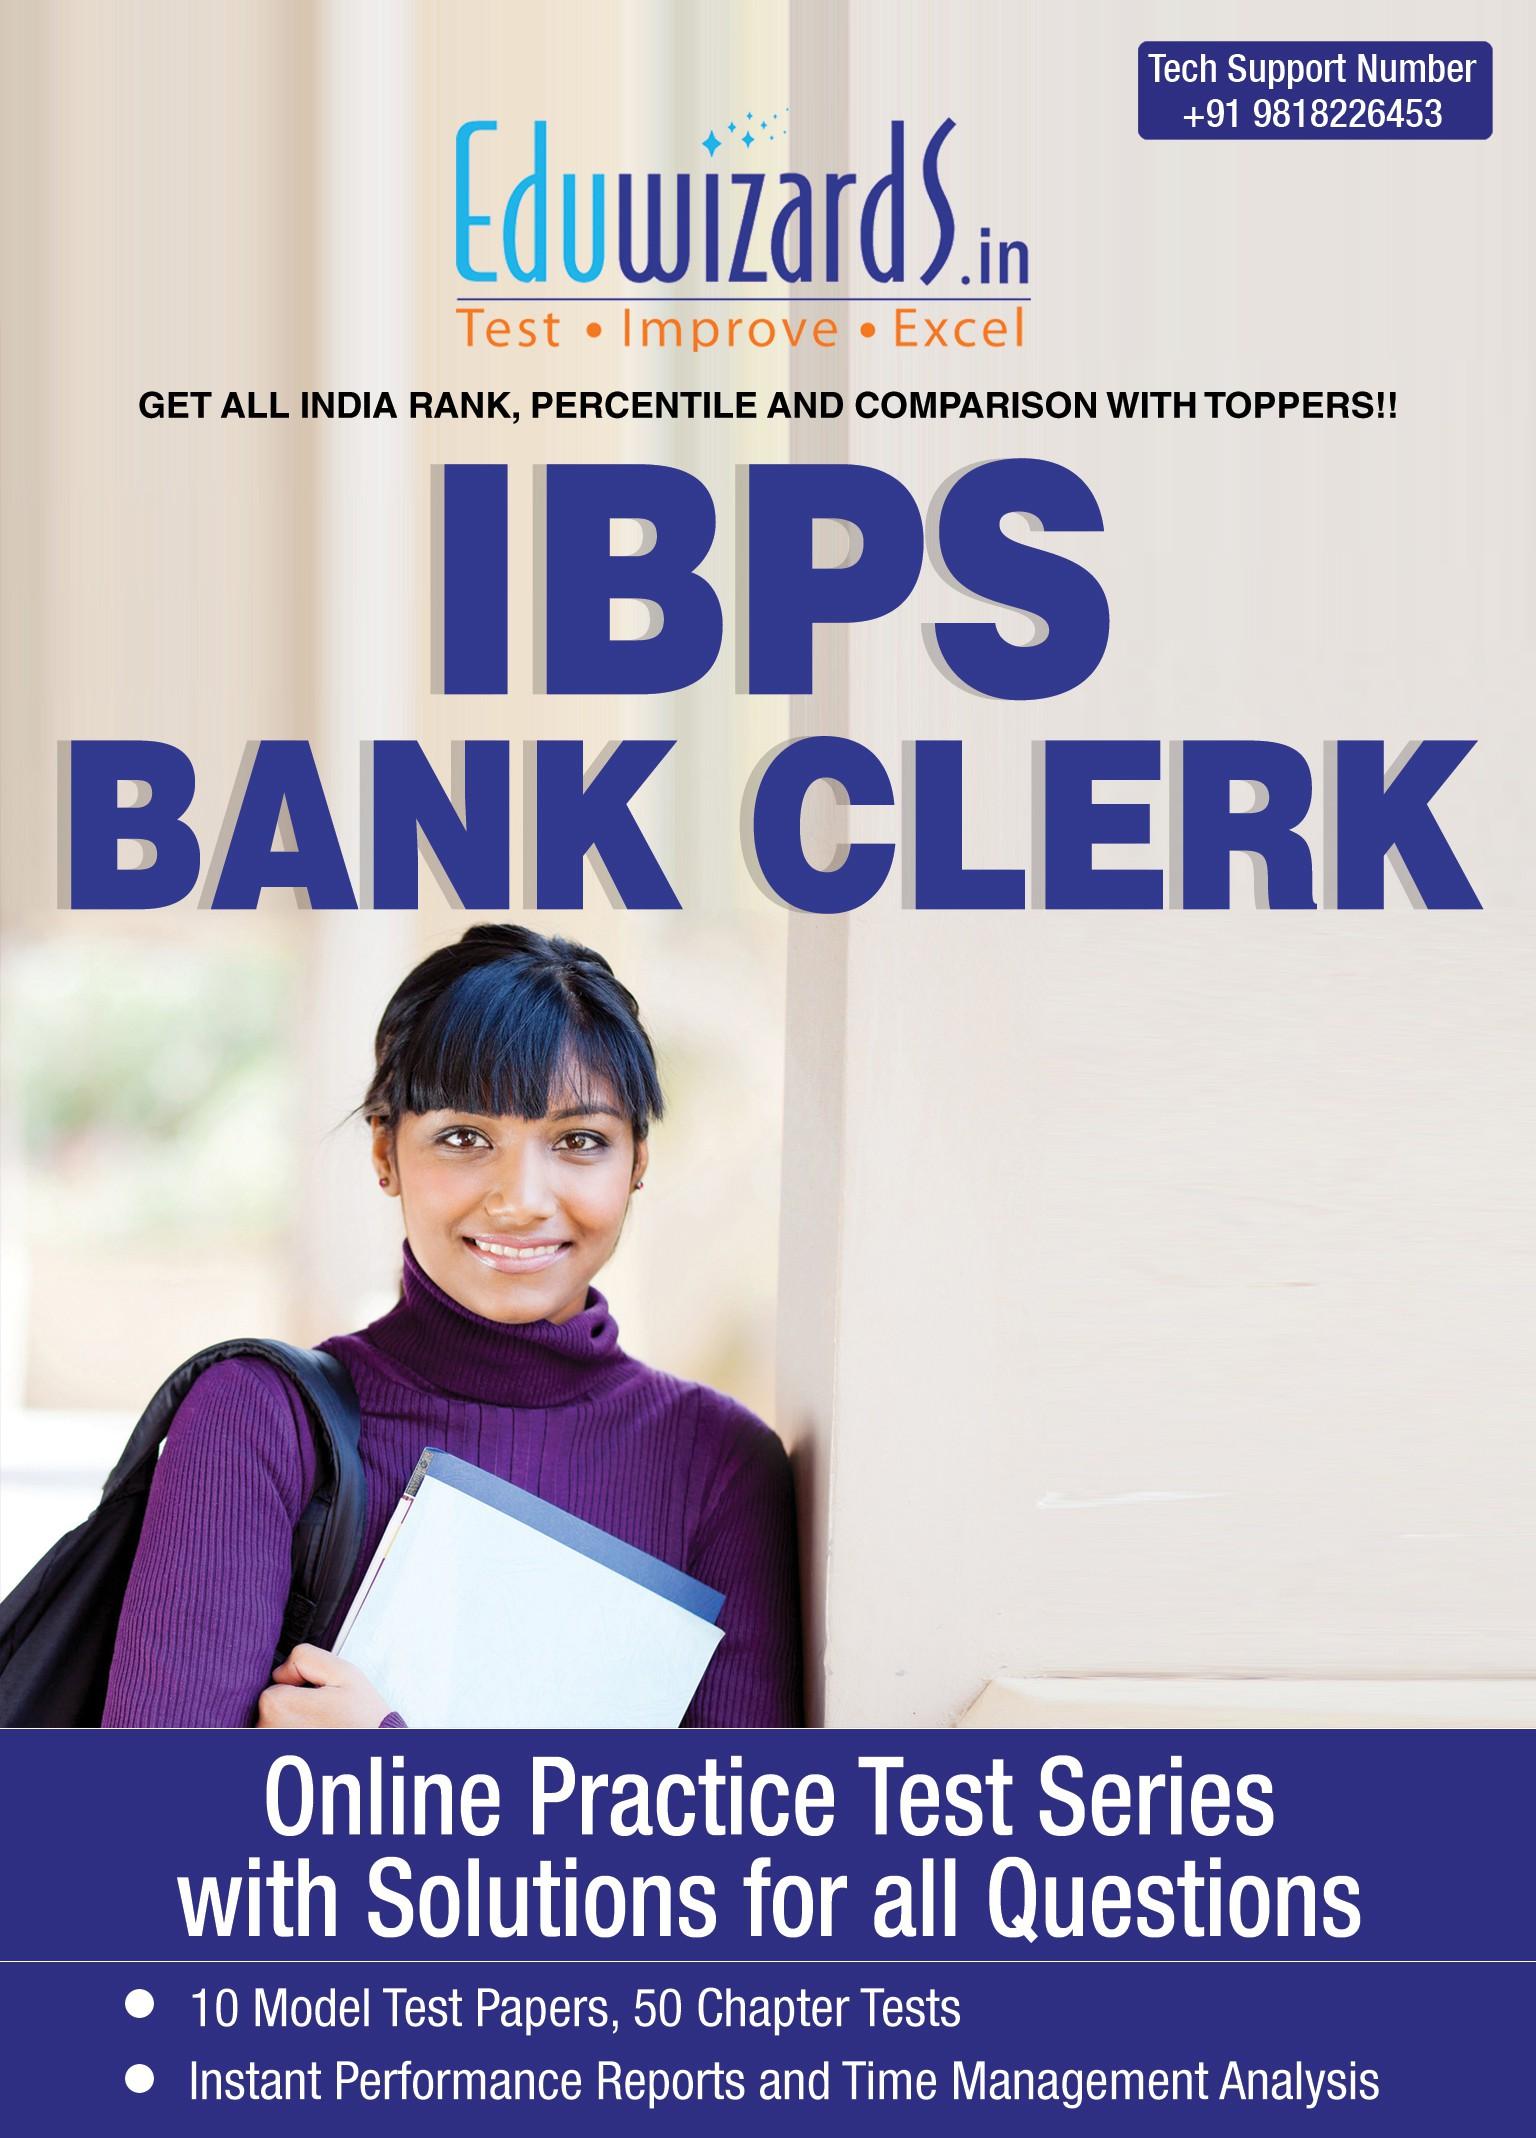 Eduwizards IBPS Bank Clerk Online Test Series Online Test(Voucher)